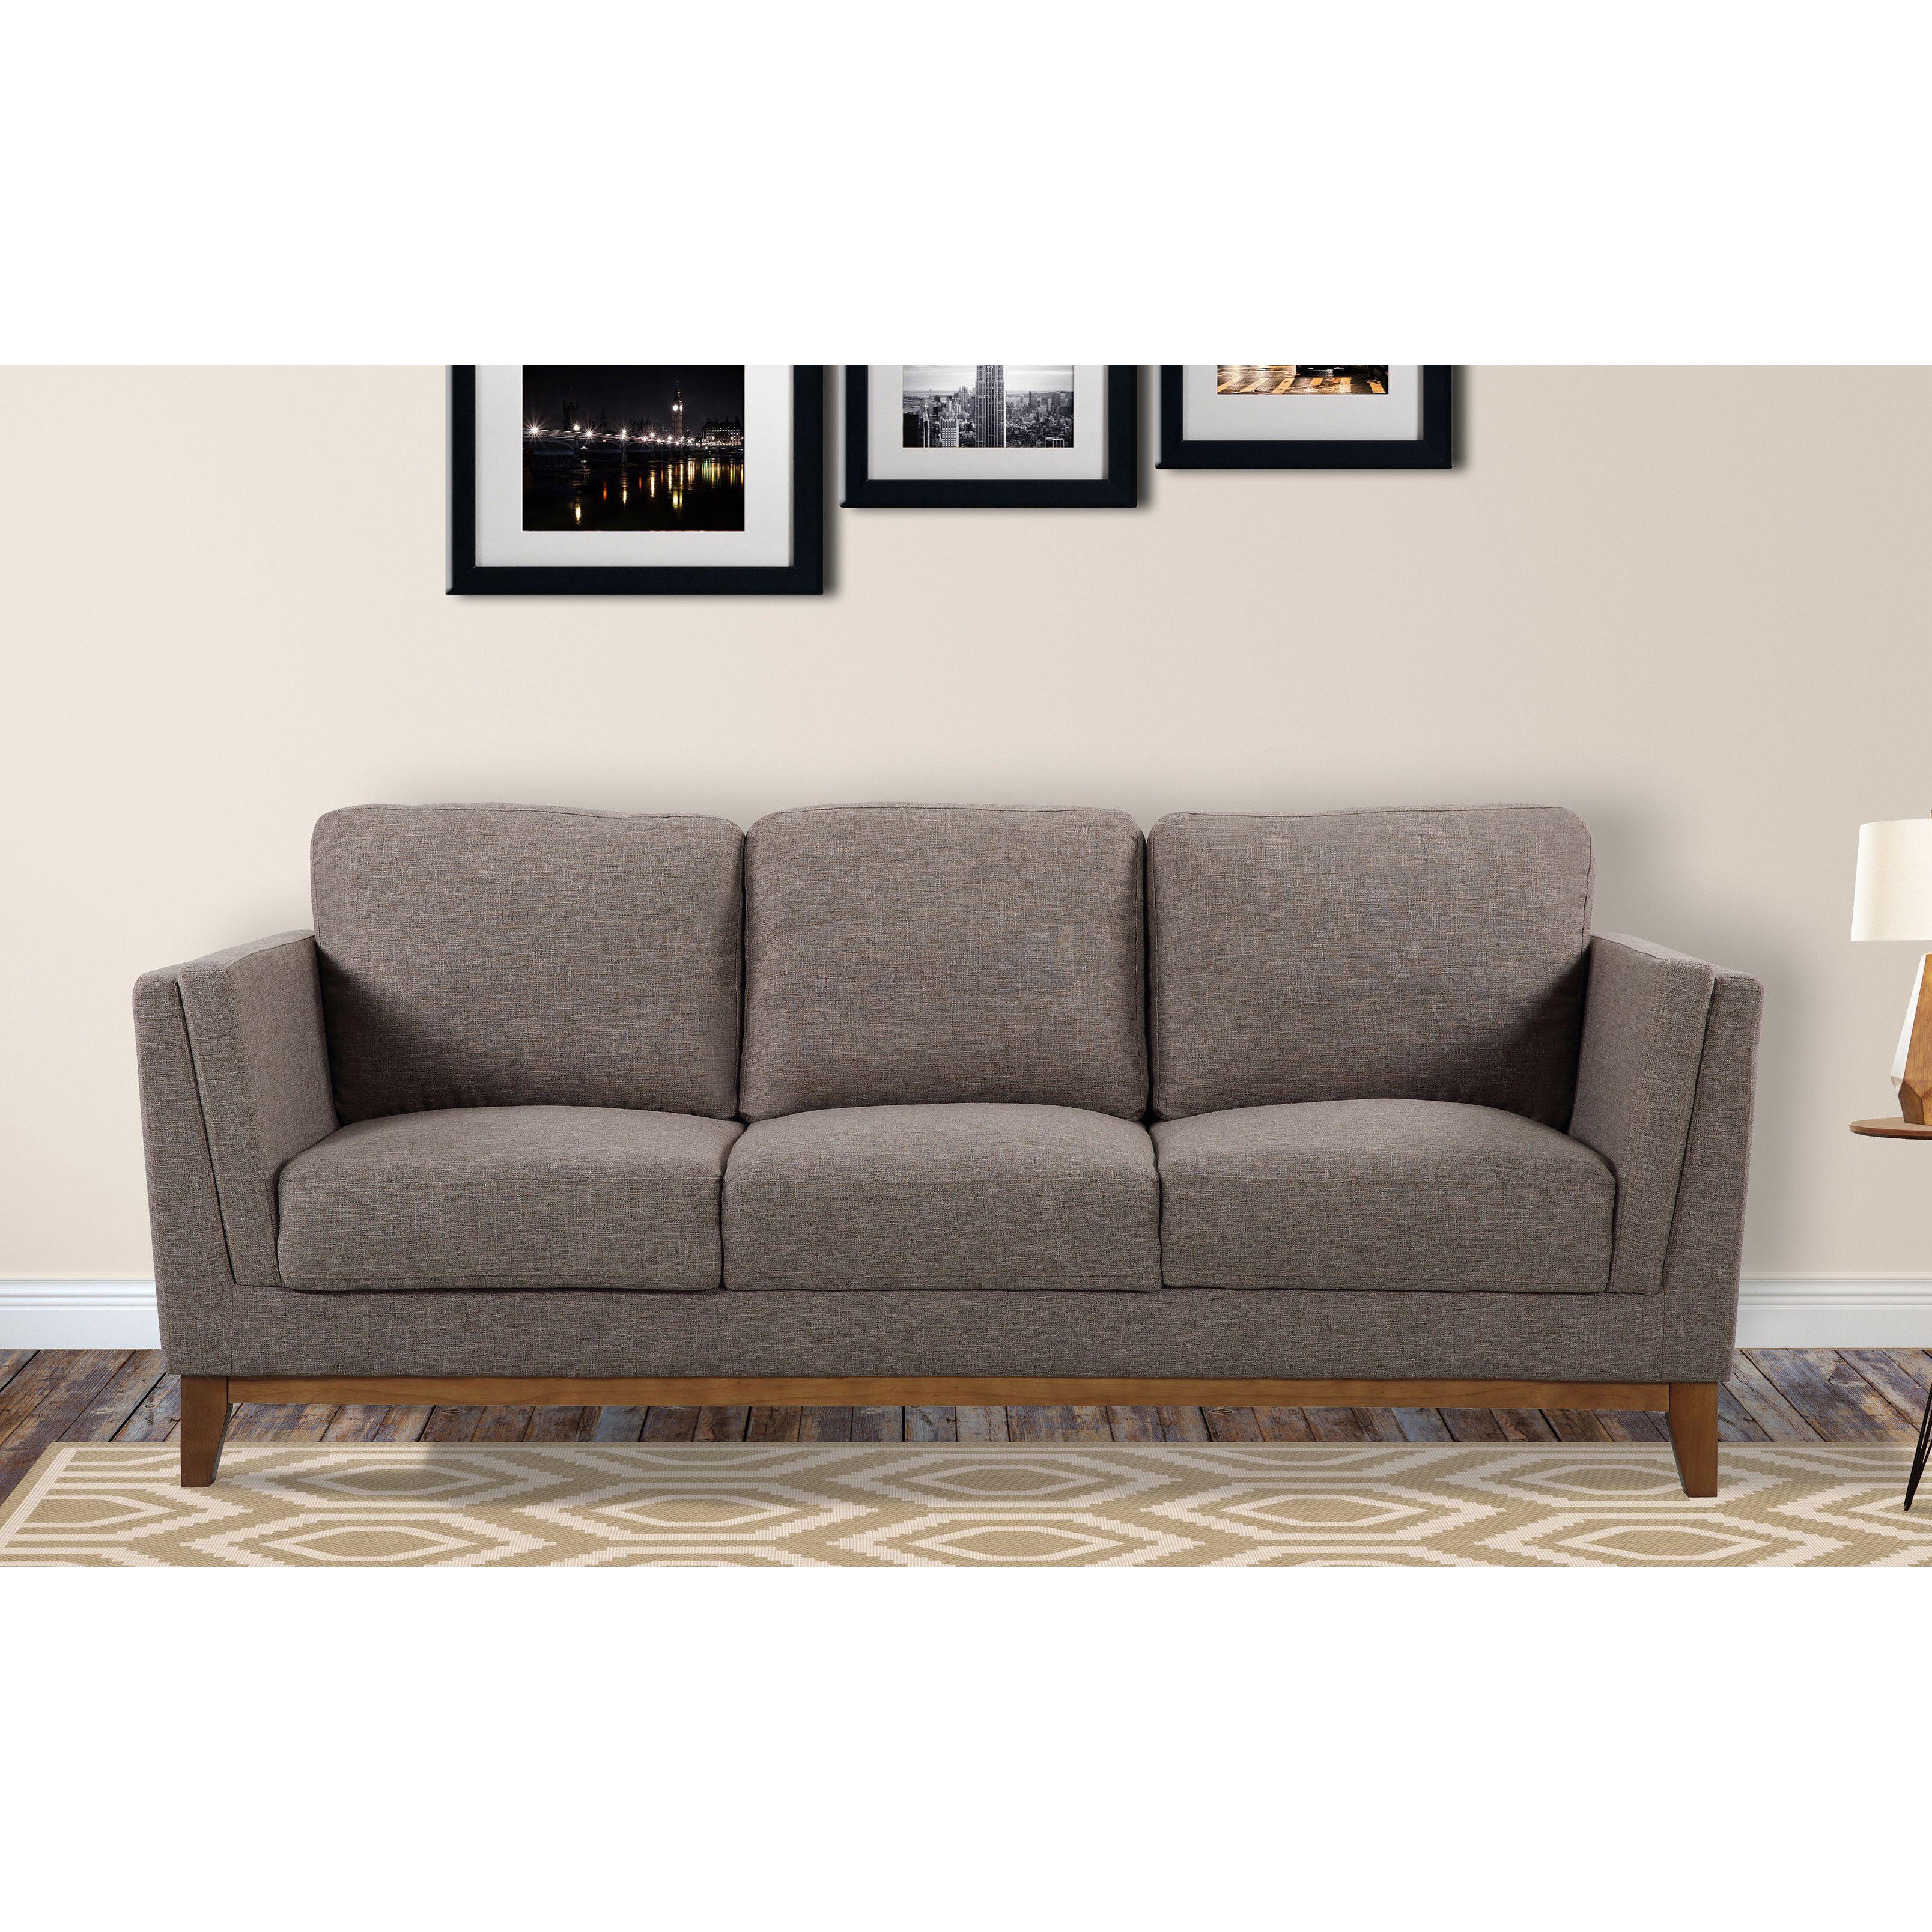 Fantastic Langley Street Artifore Modern Sofa Reviews Wayfair Inzonedesignstudio Interior Chair Design Inzonedesignstudiocom